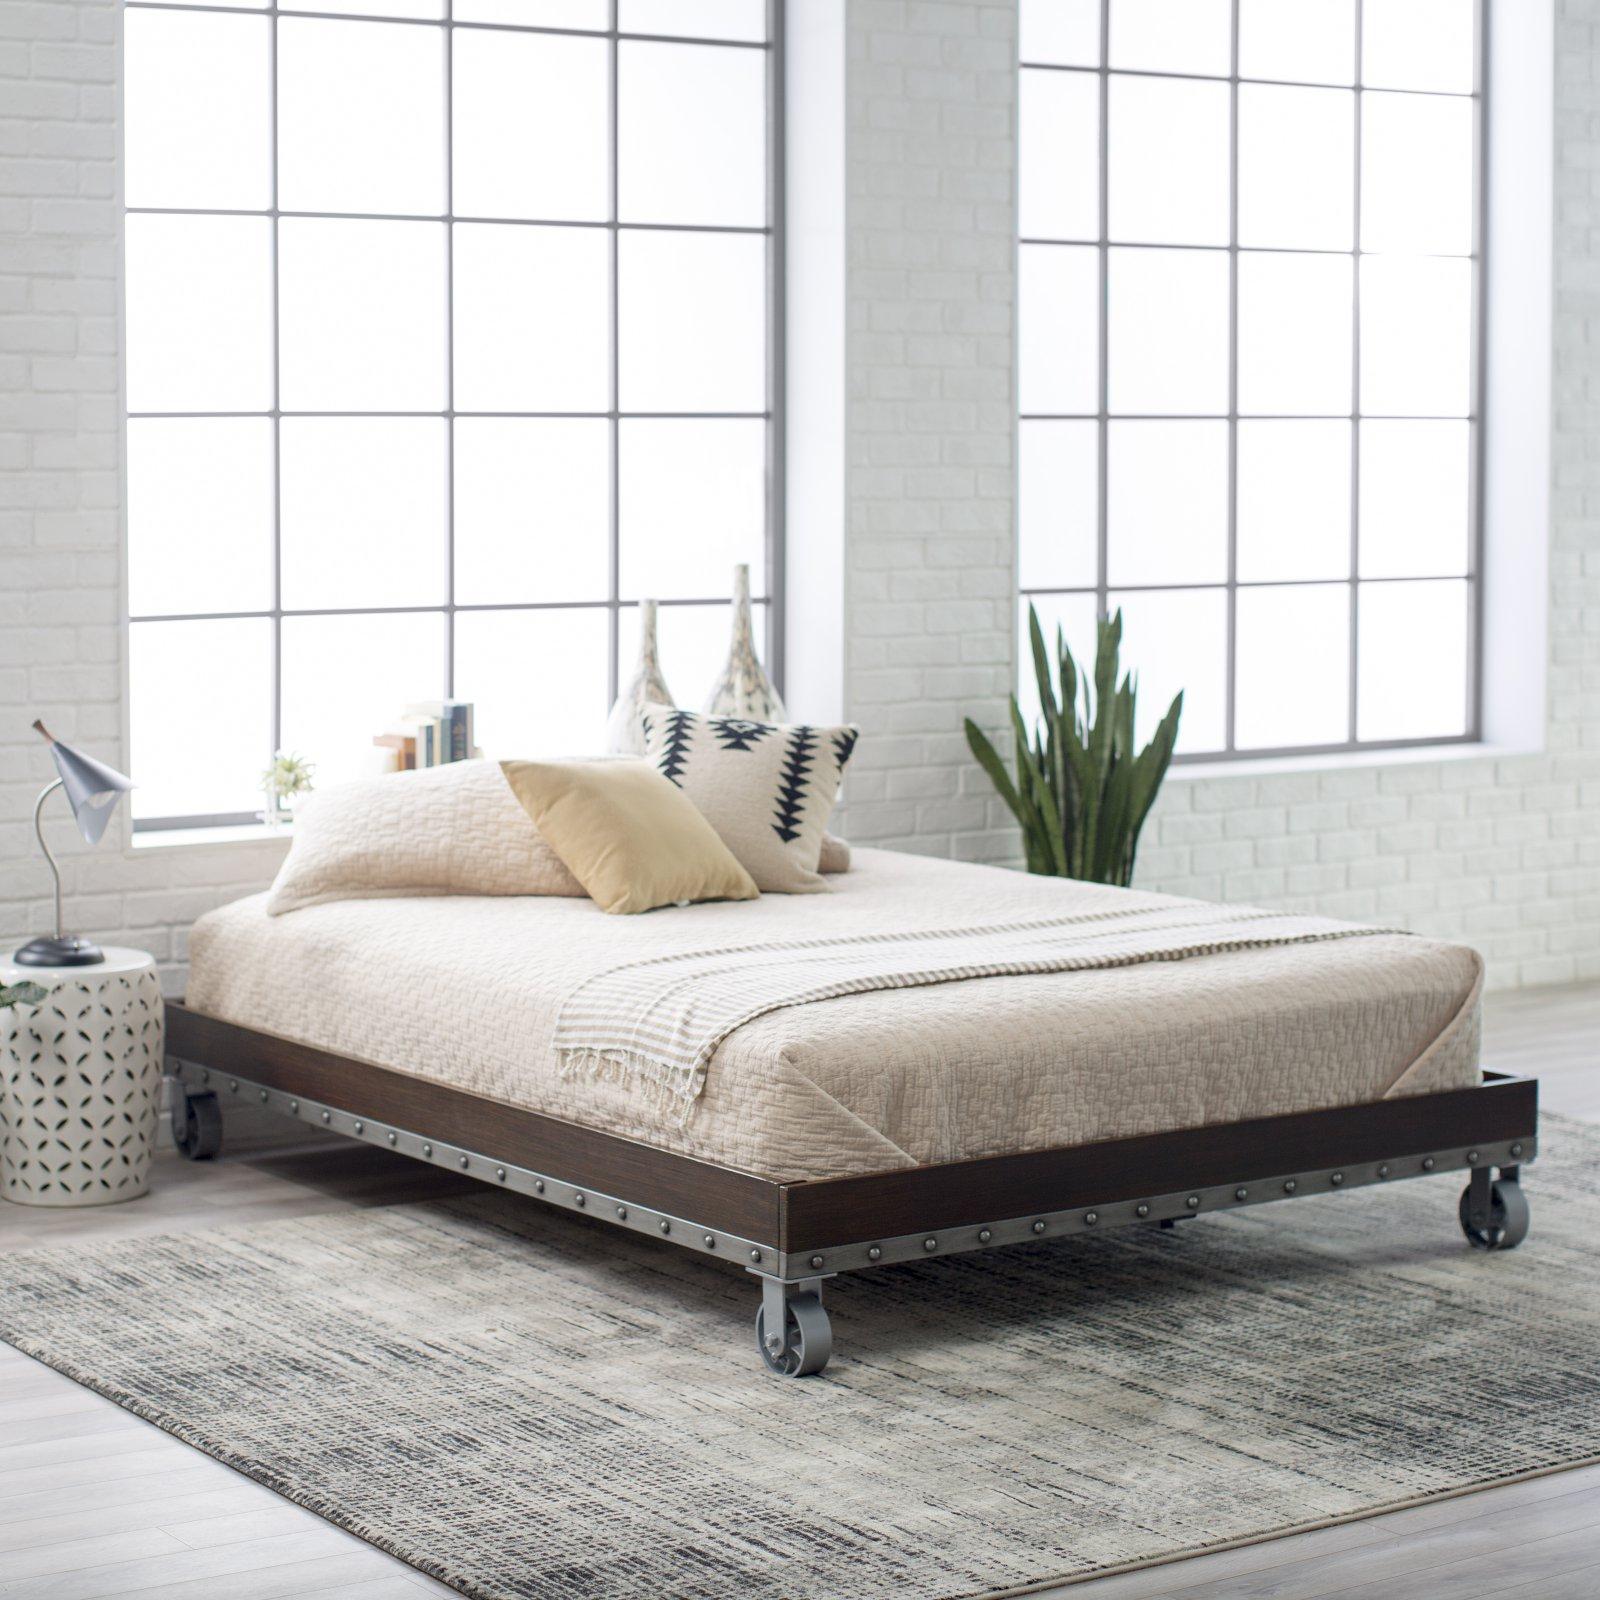 Belham Living Merced Platform Cart Bed